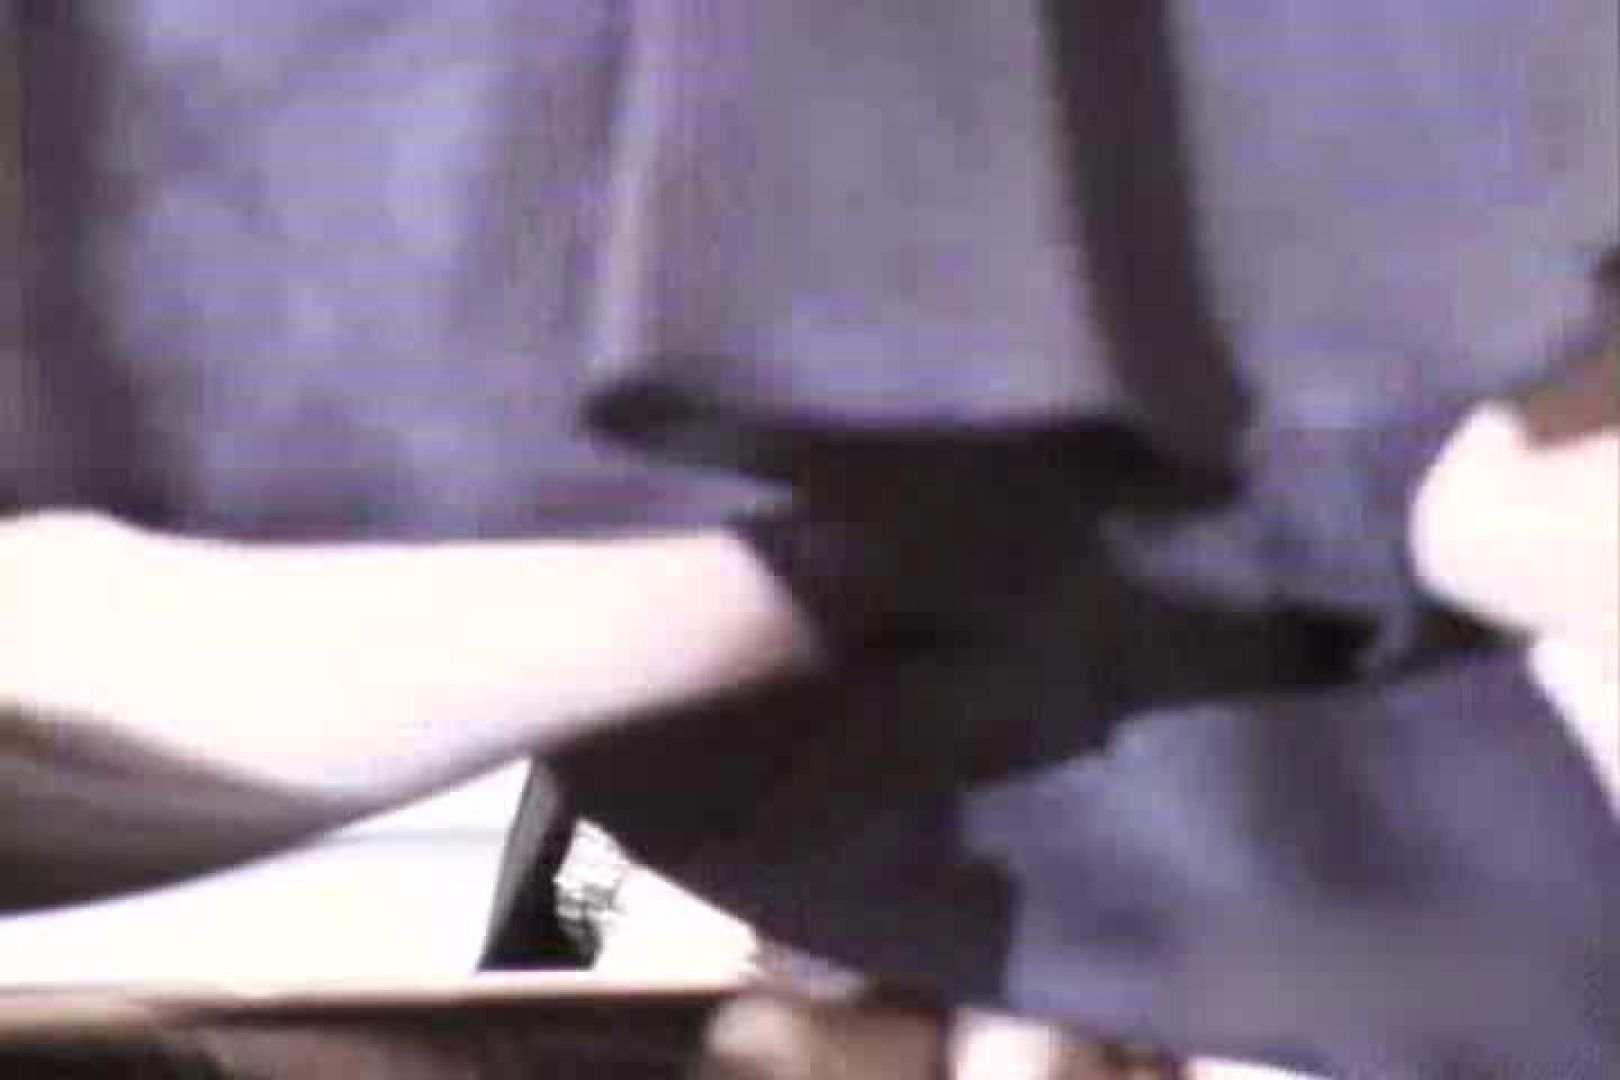 RQカメラ地獄Vol.21 エロティックなOL ワレメ無修正動画無料 104画像 65